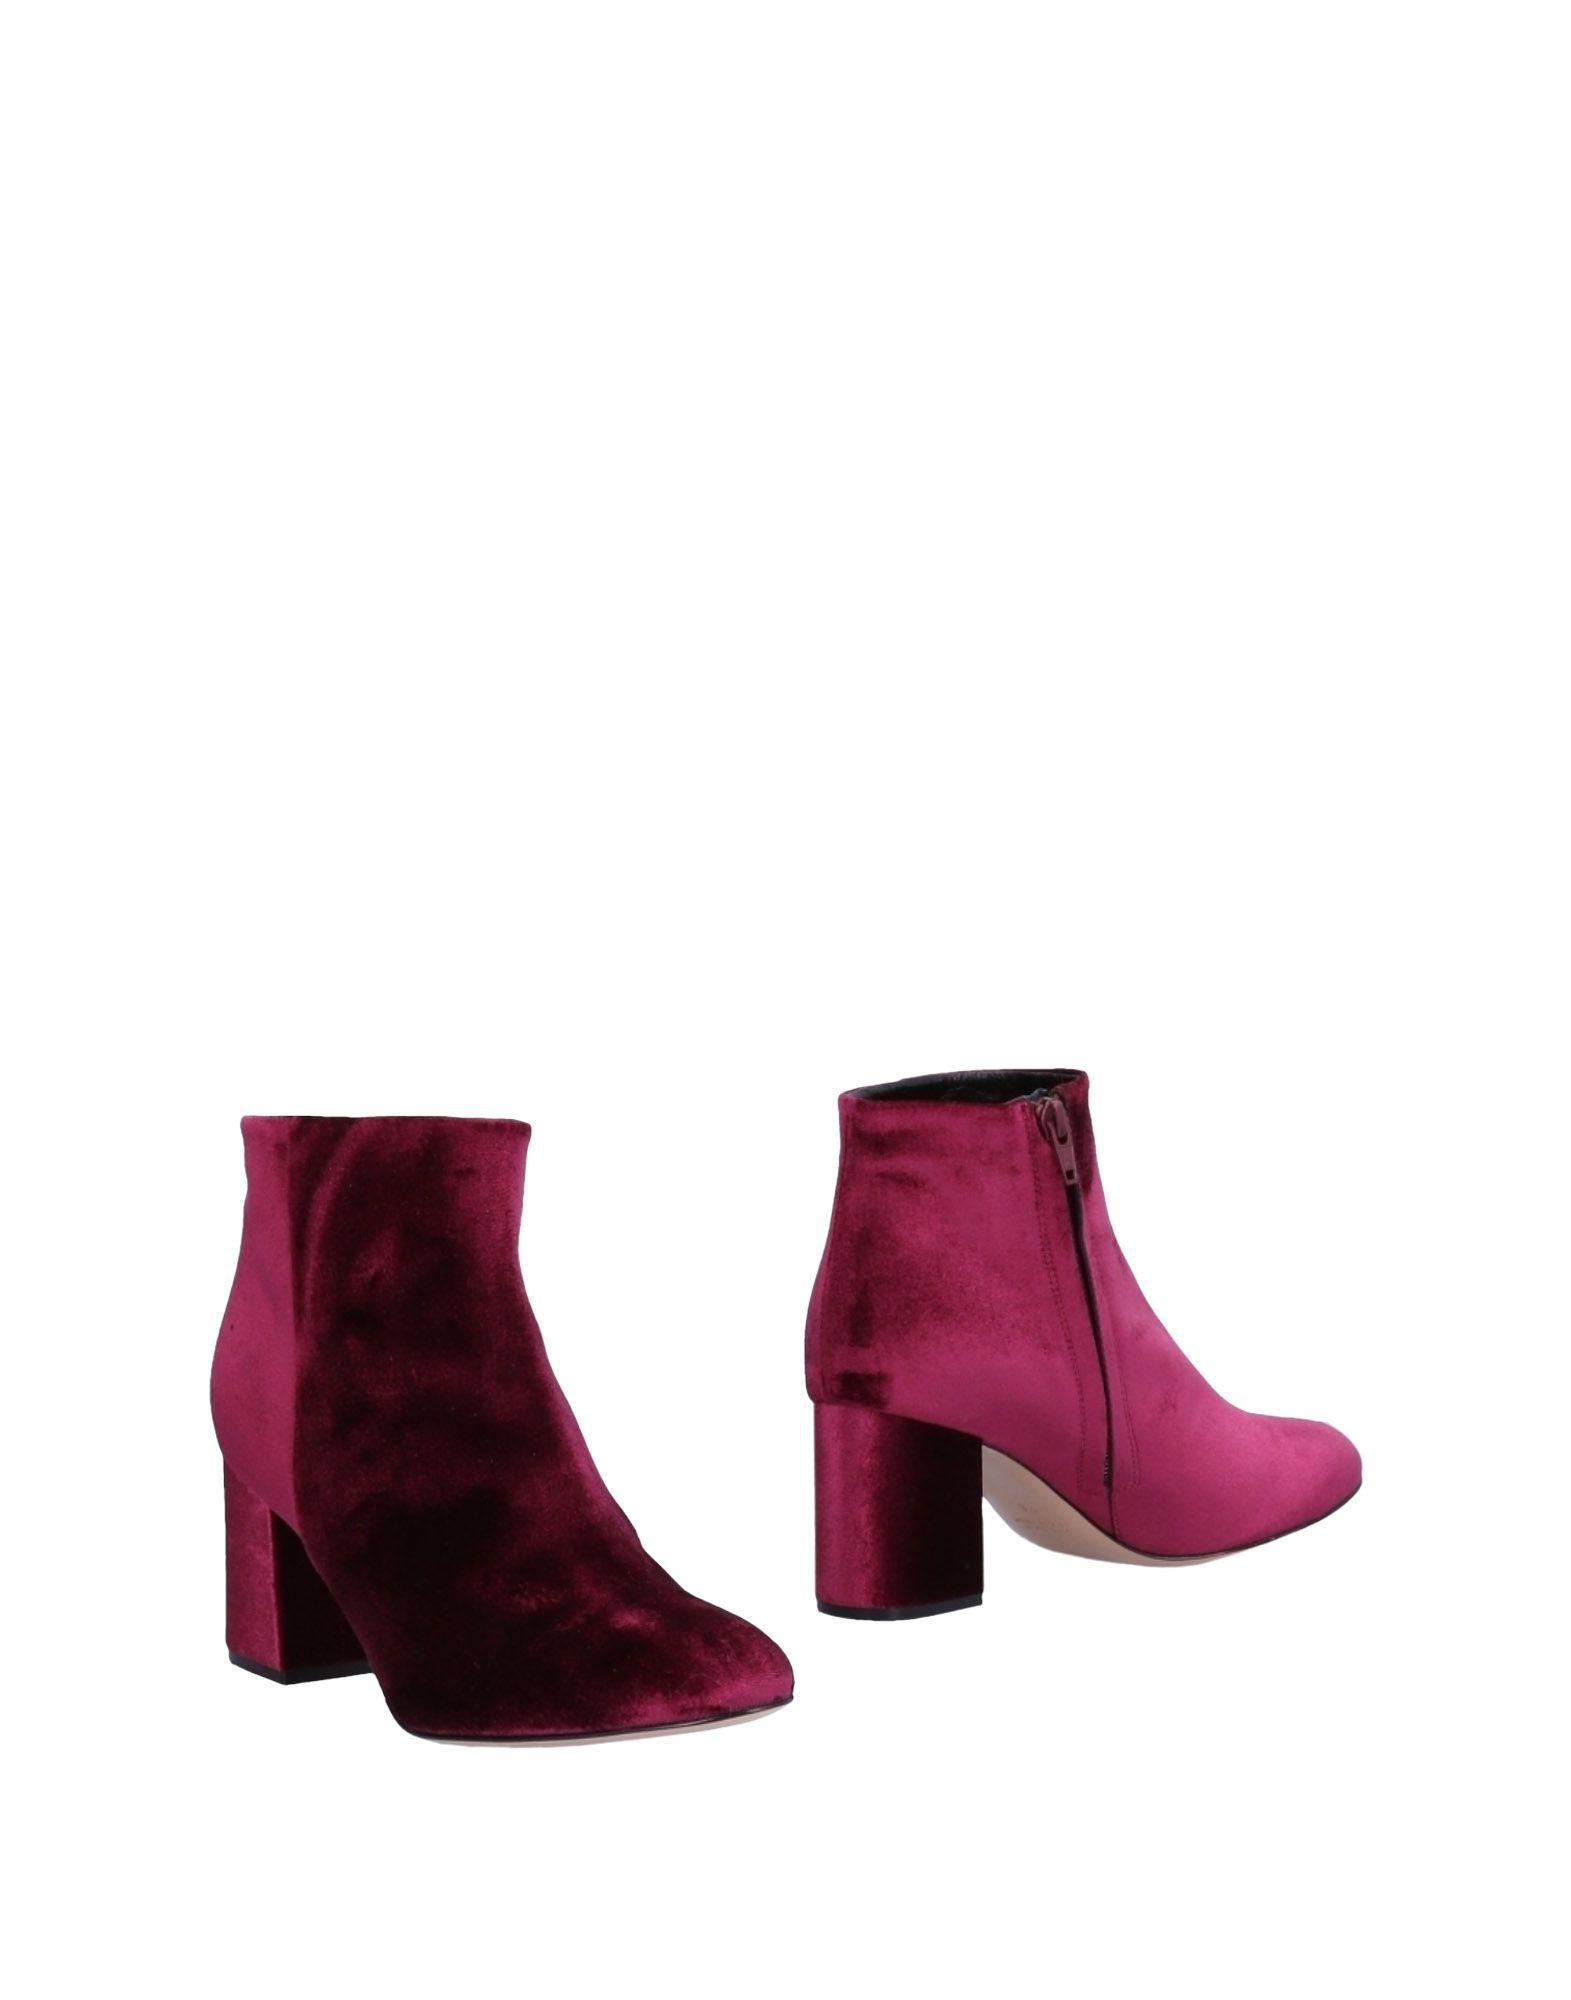 Gut um billige Schuhe Damen zu tragenOreni 1903 Stiefelette Damen Schuhe  11484224ES f56f7c